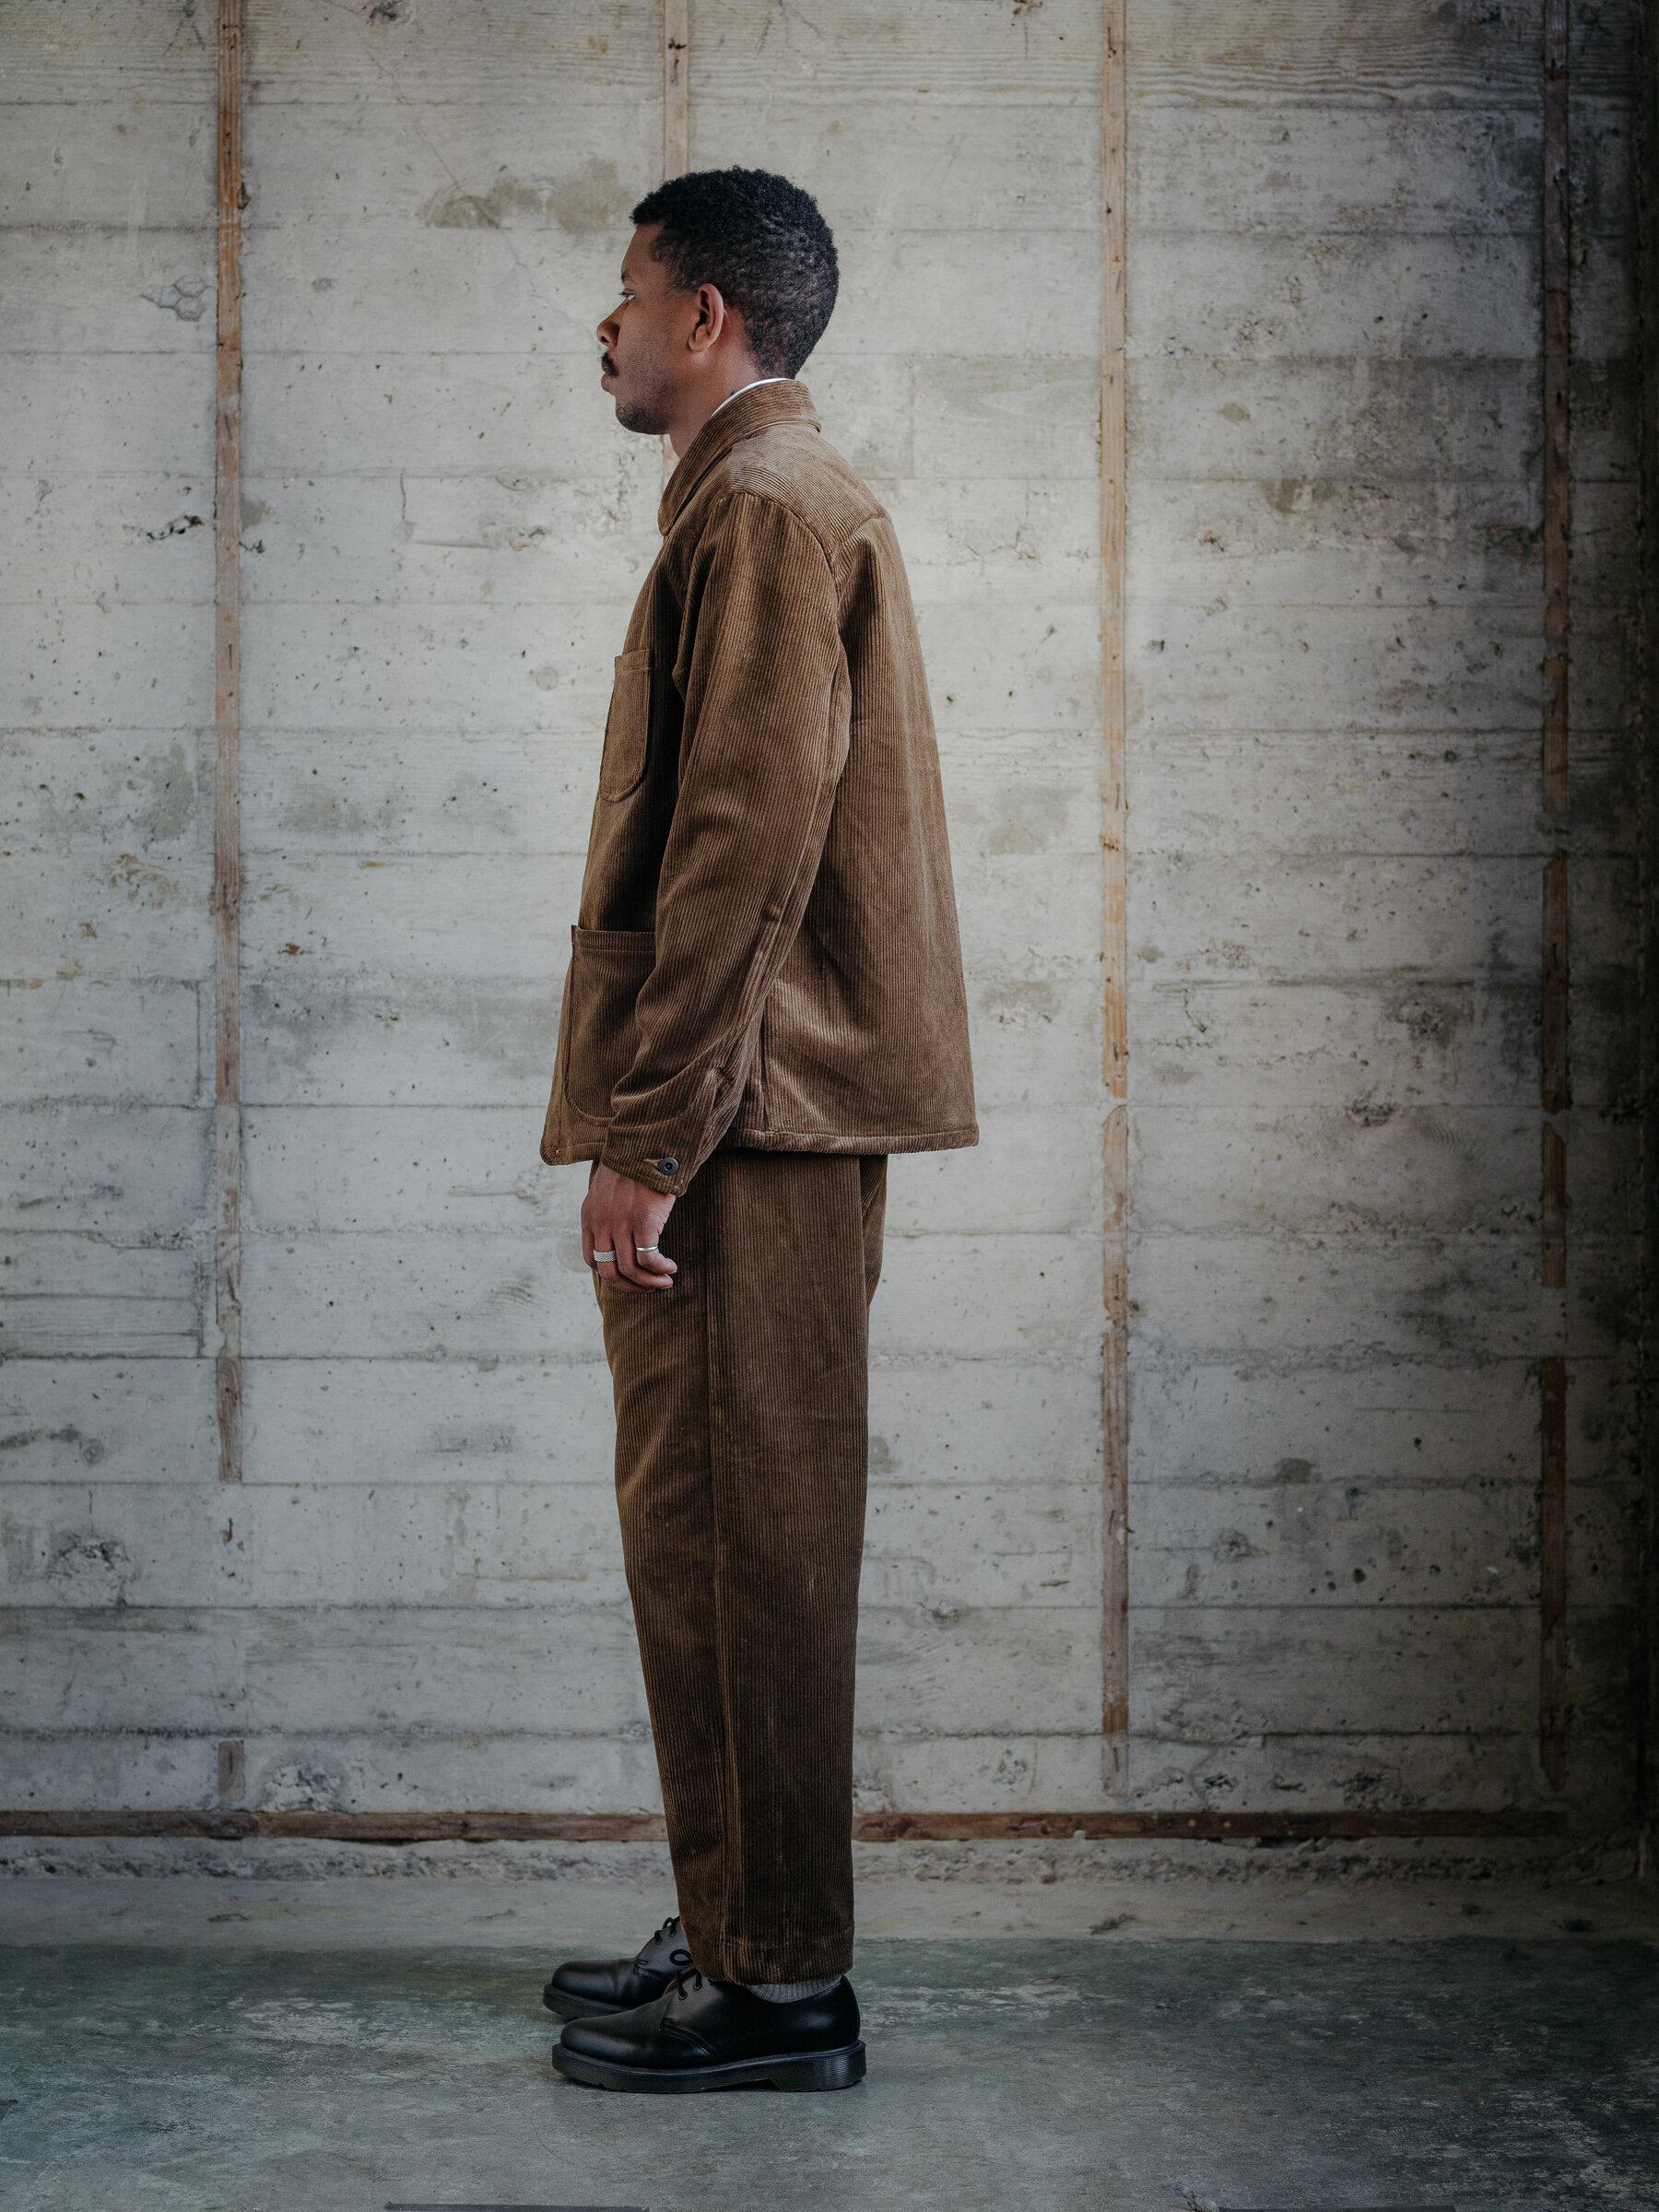 evan-kinori-three-pocket-jacket-organic-cotton-corduroy-woven-in-germany-2